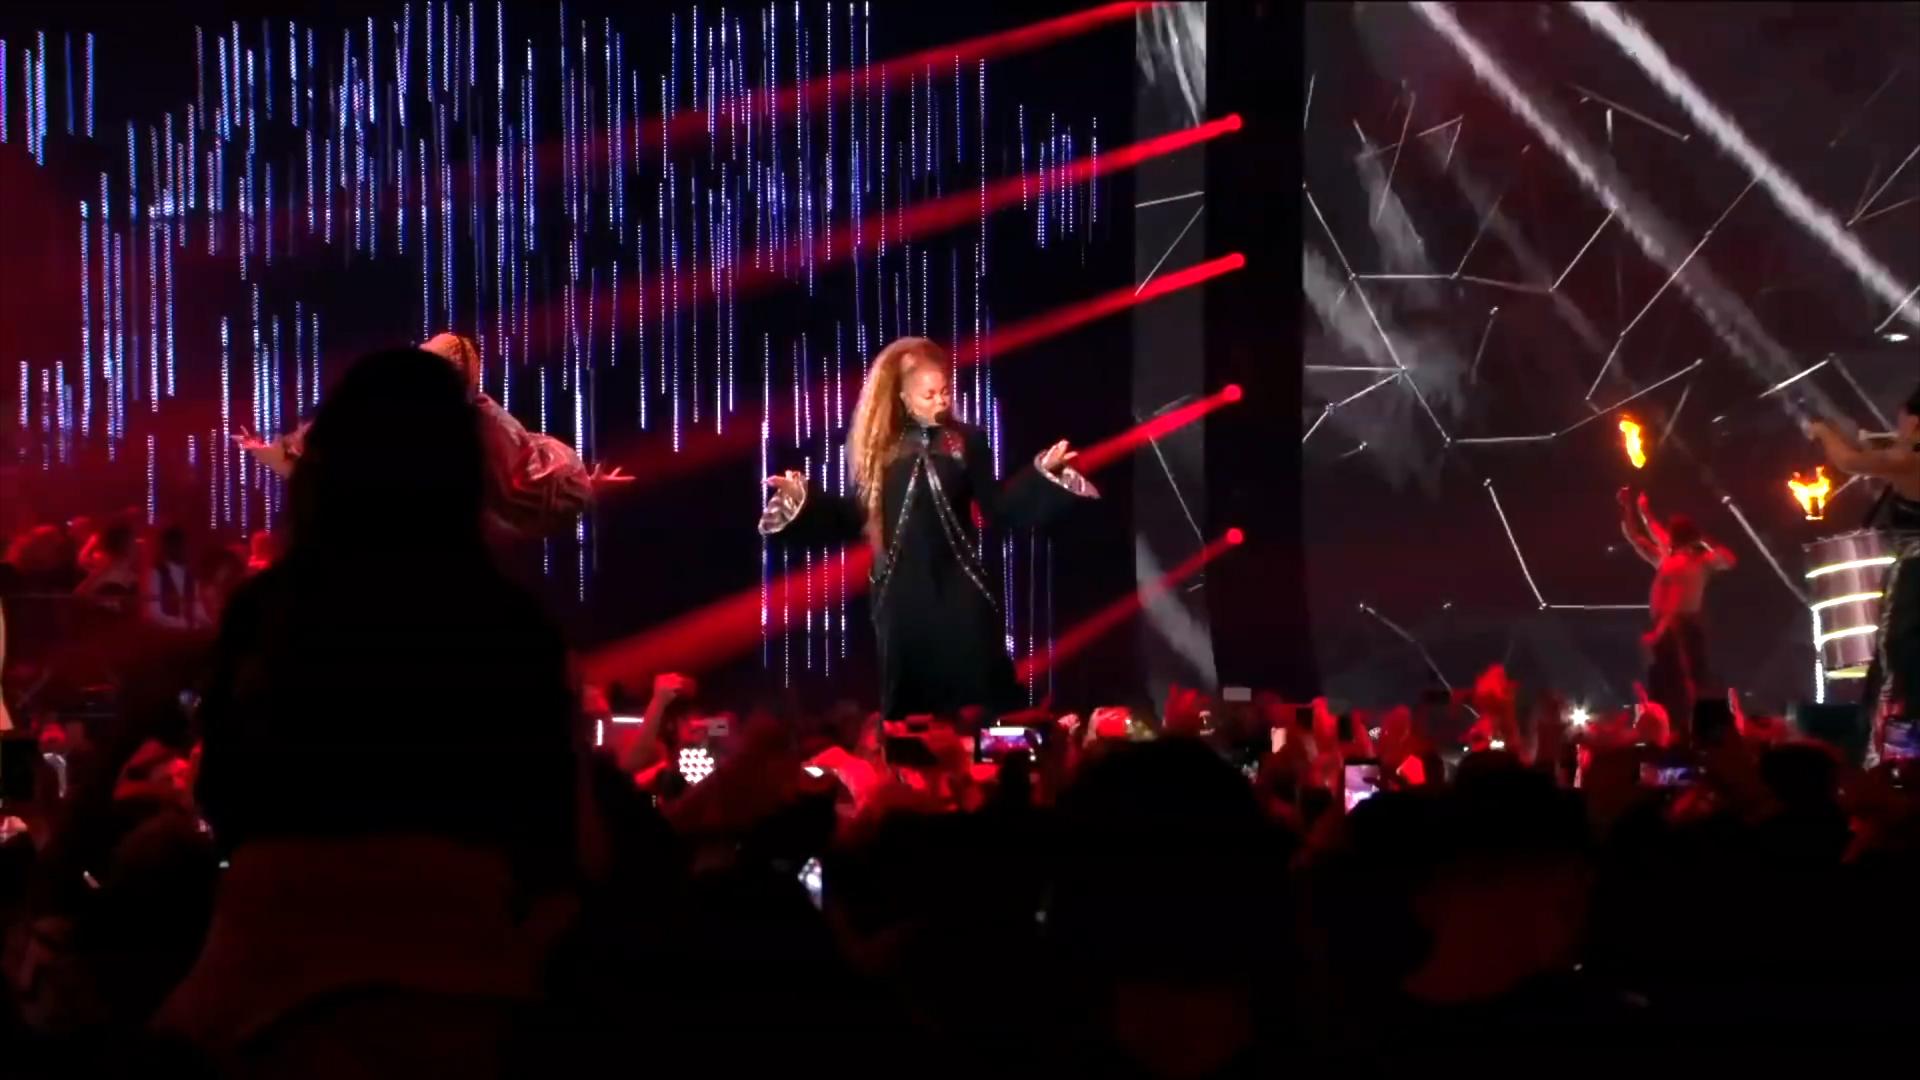 Janet Jackson -  Made For Now   Rhythm Nation   All For You  Live   MTV EMAs 2018 (0-02-41-09).jpg